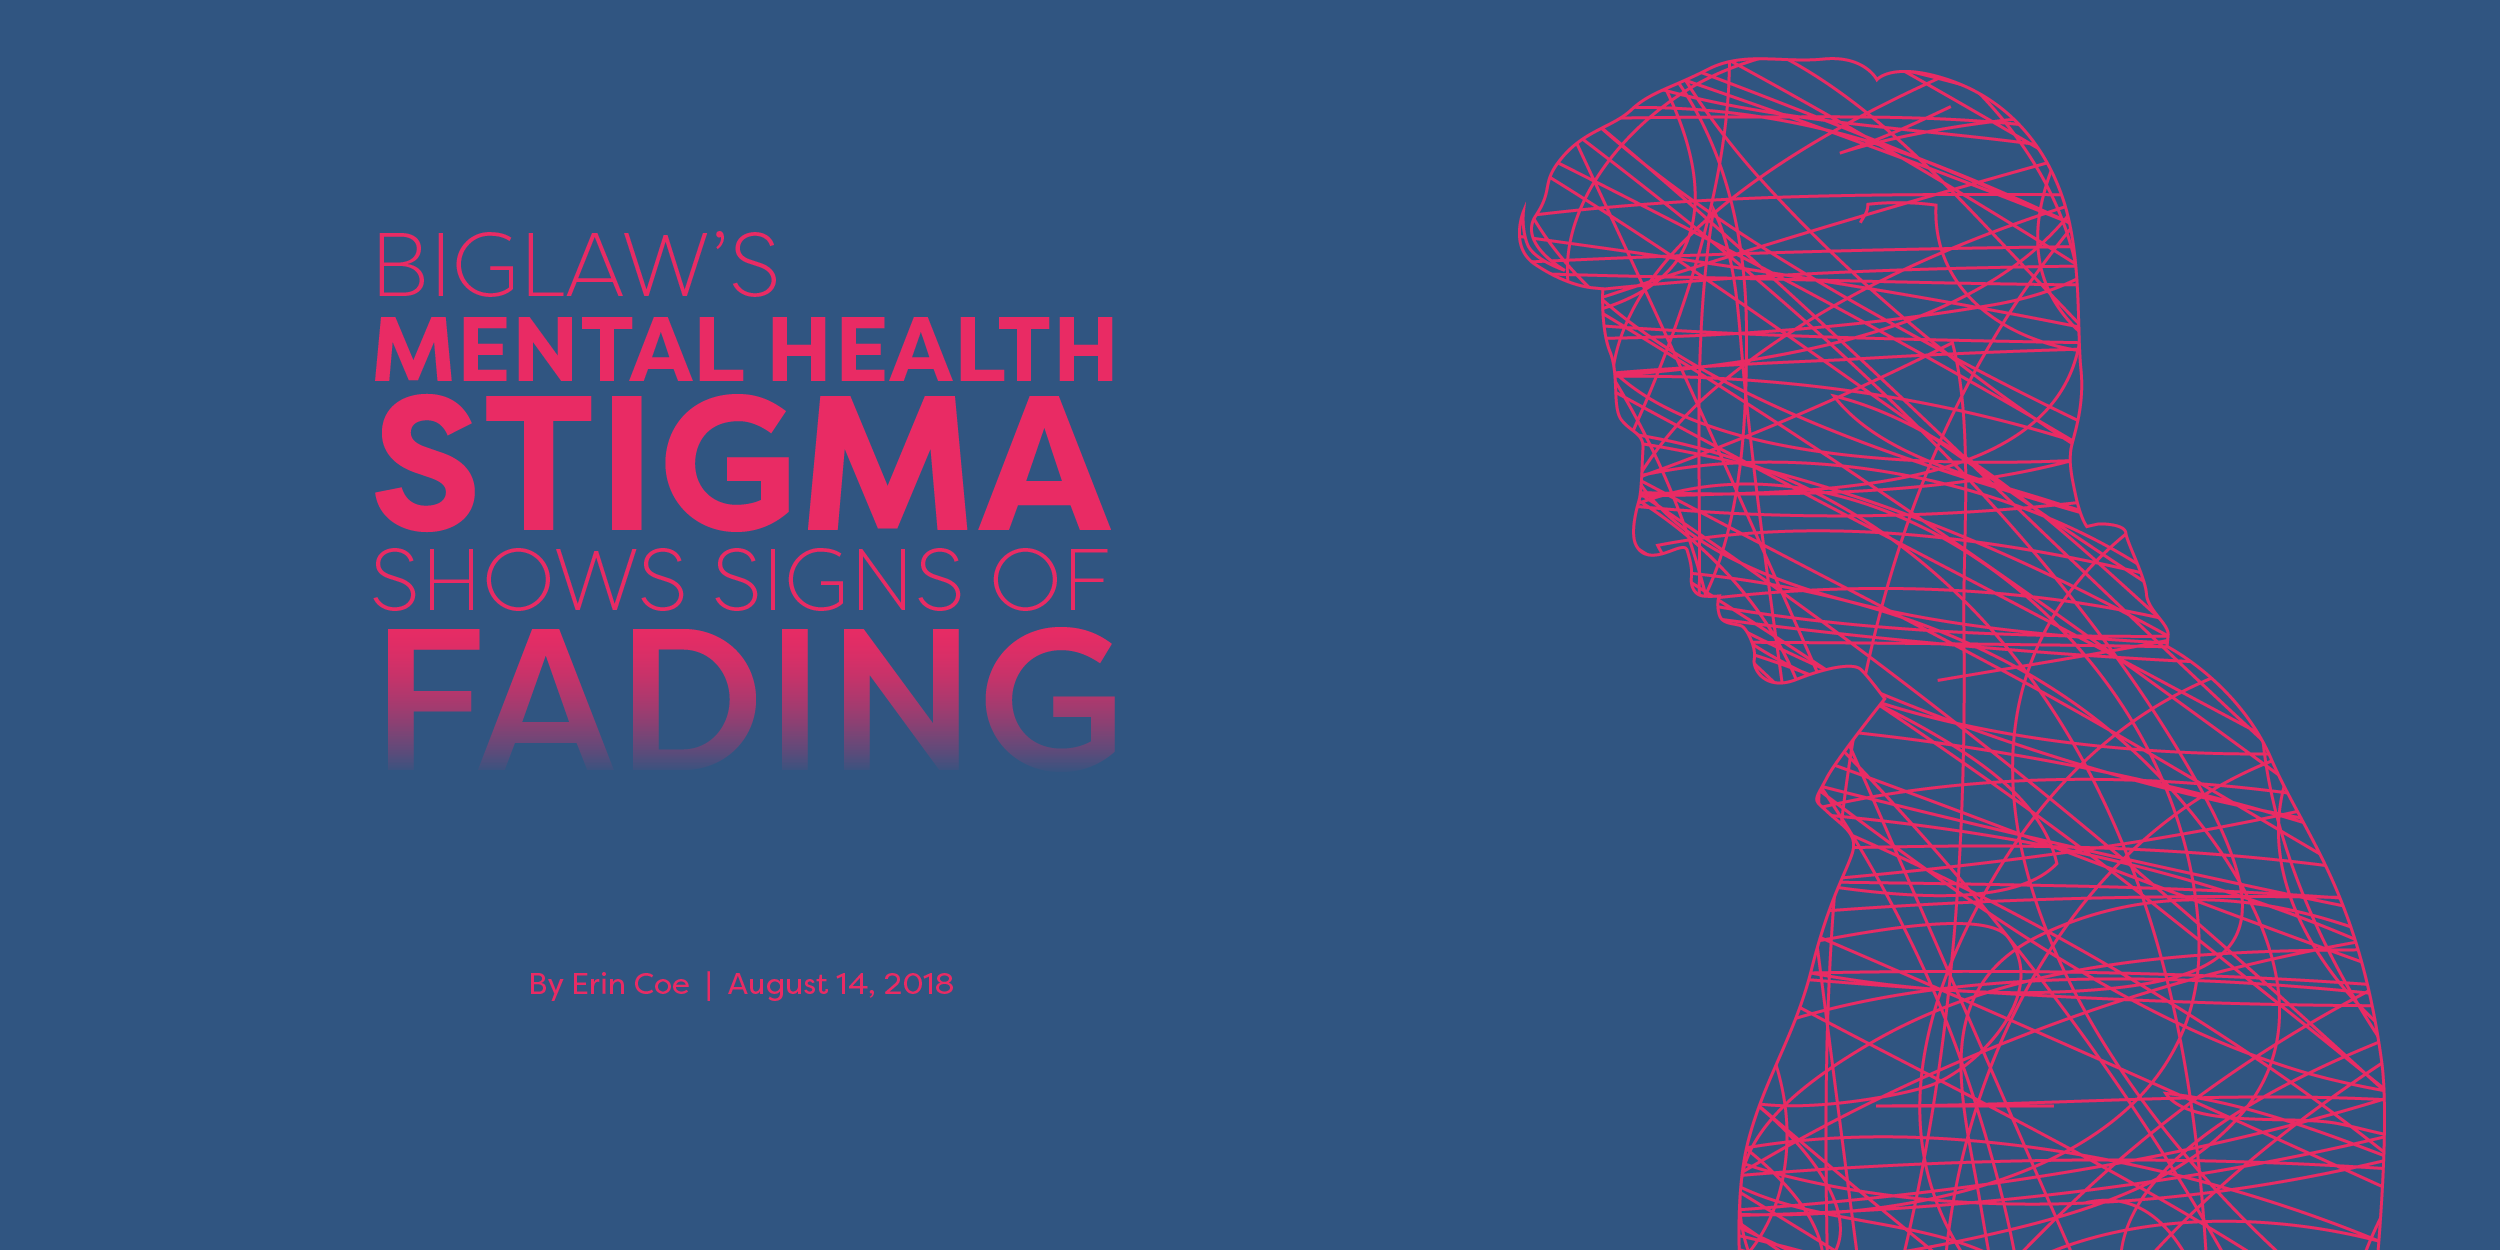 Biglaw S Mental Health Stigma Shows Signs Of Fading Law360